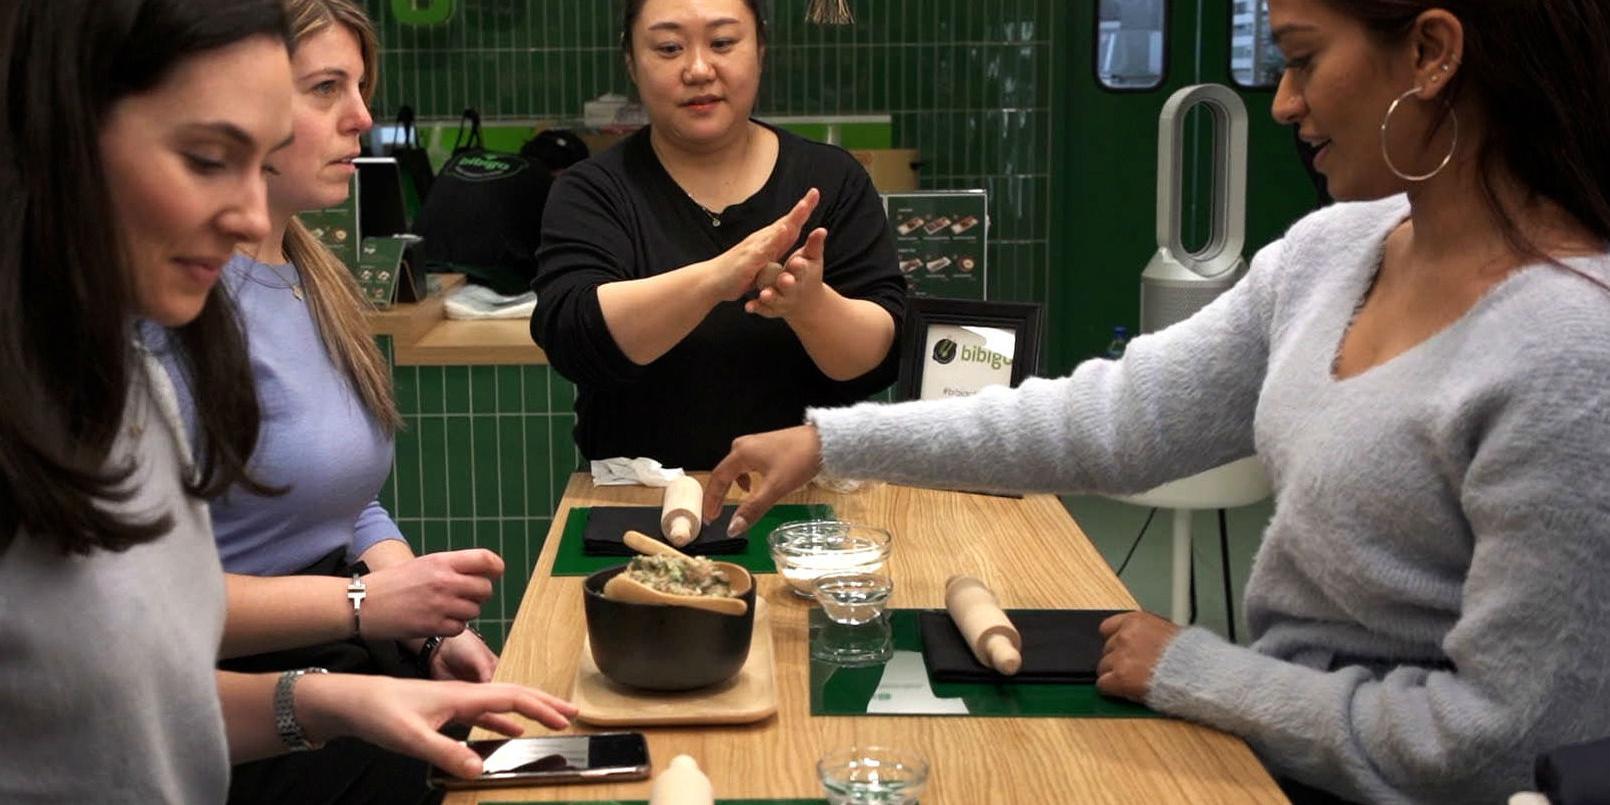 """CJ제일제당, 뉴욕 '비비고 팝업 레스토랑'에서 만두빚기 행사 열어"